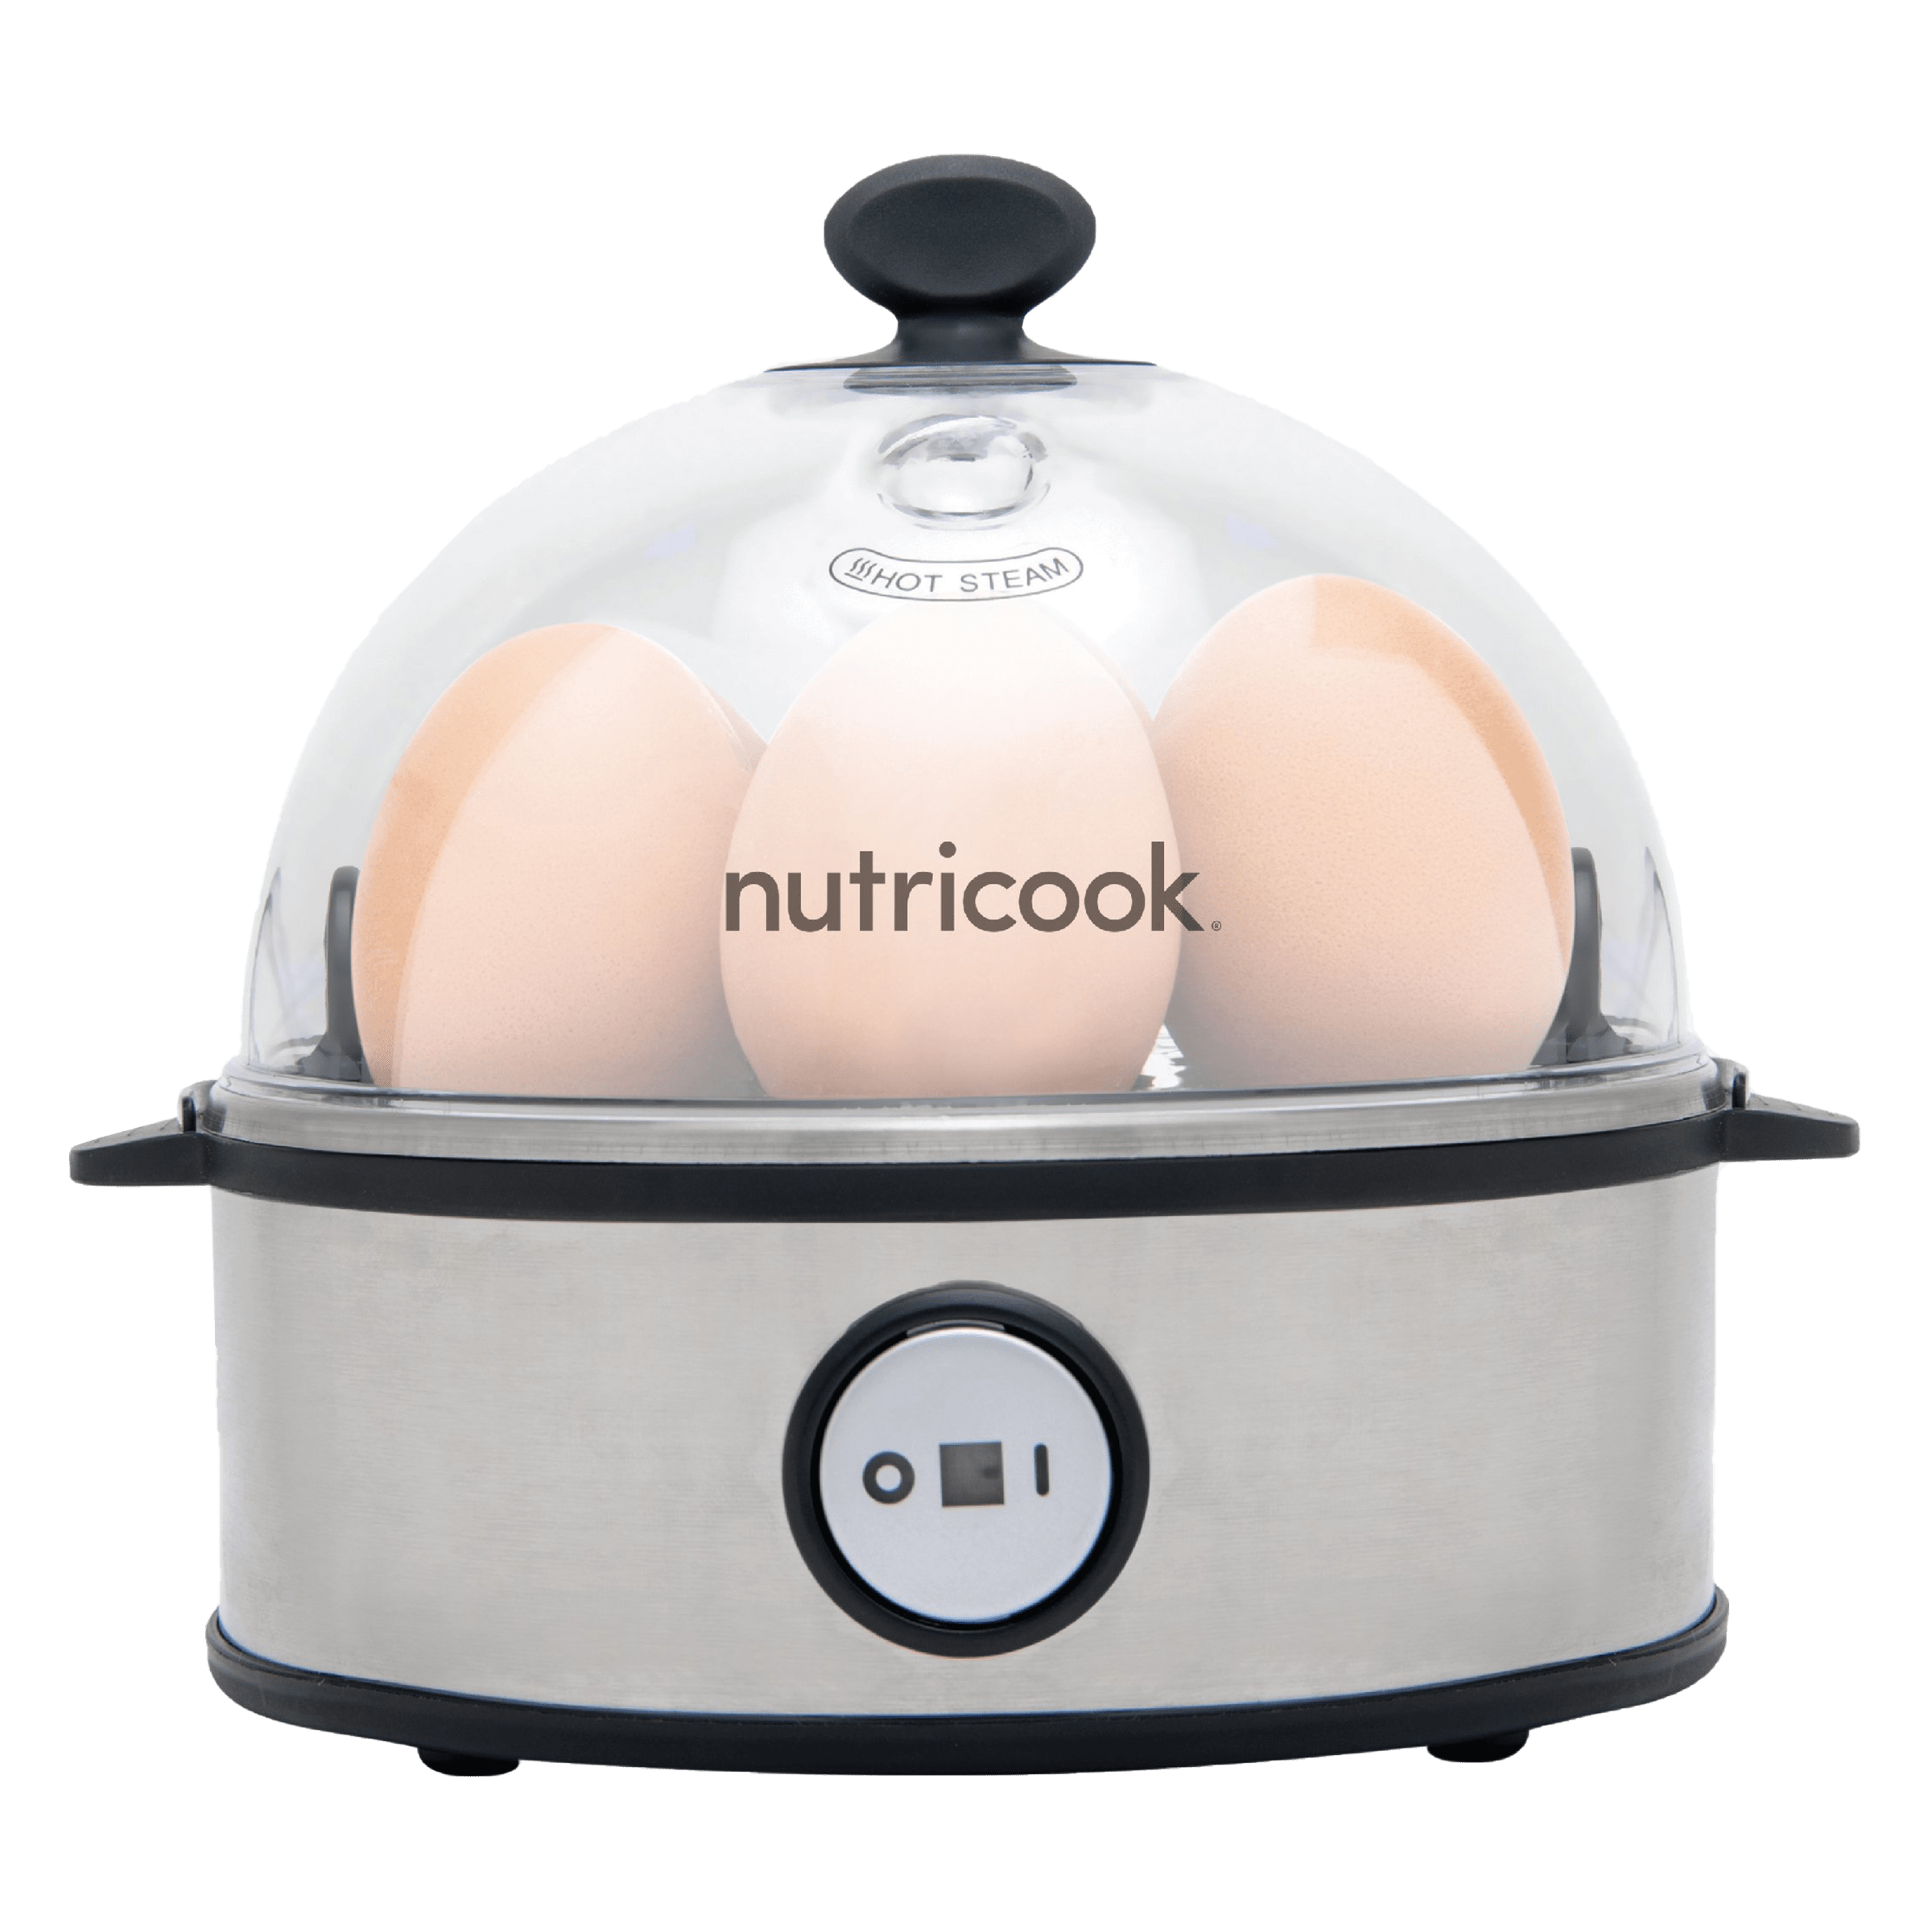 Nutricook by Nutribullet Rapid 7 Eggs Electricity Egg Boiler (NC-EC360, Silver)